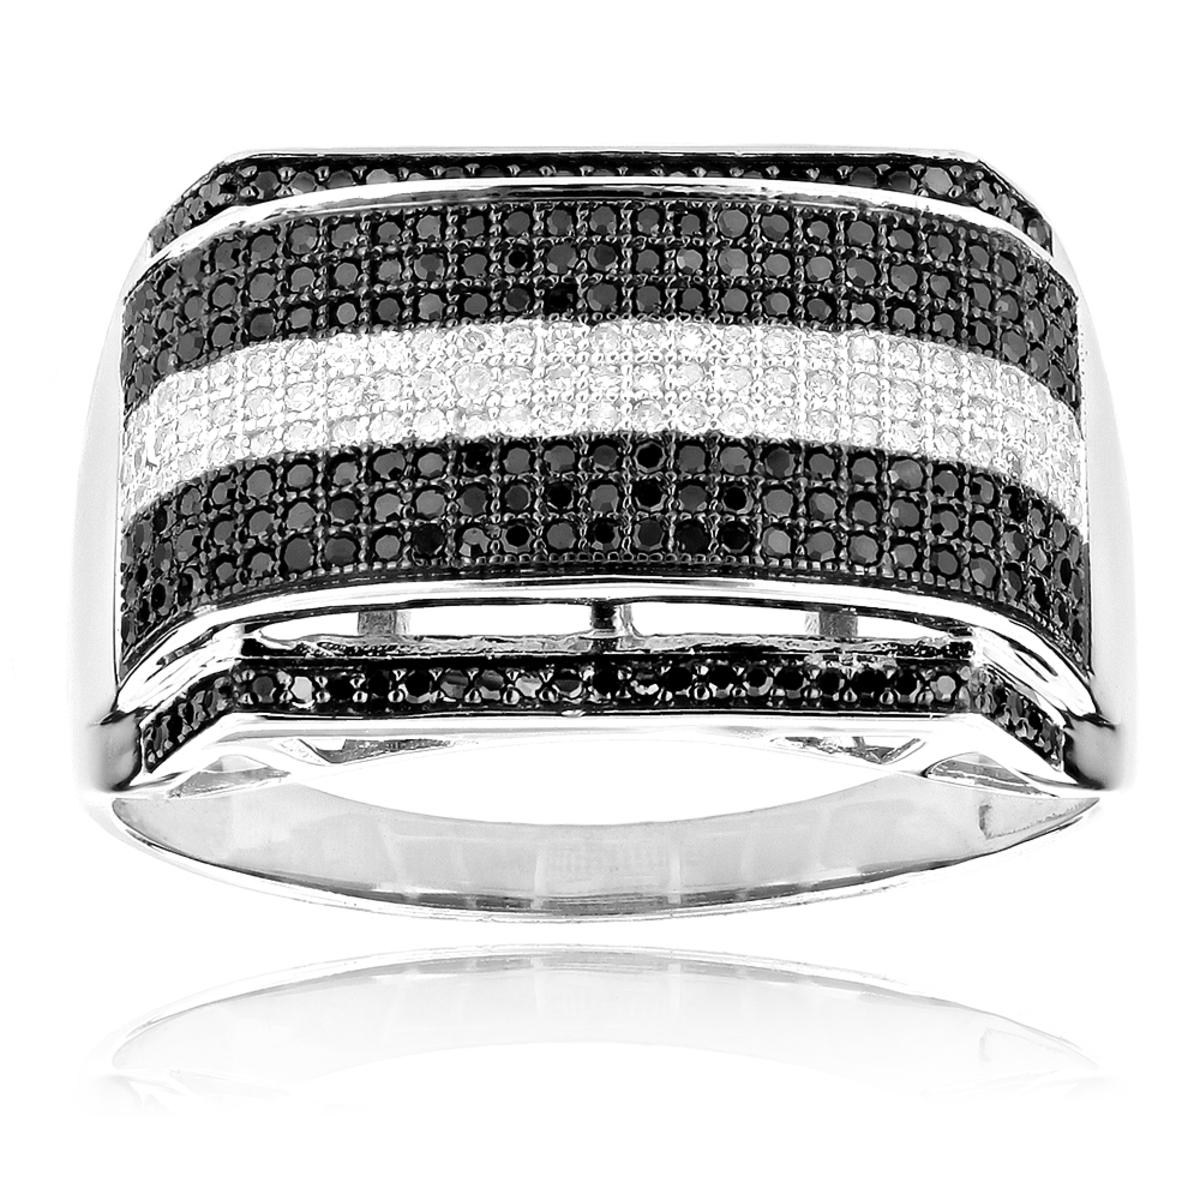 White and Black Diamonds Ring 0.84ct 10k Gold Mens Diamond Band